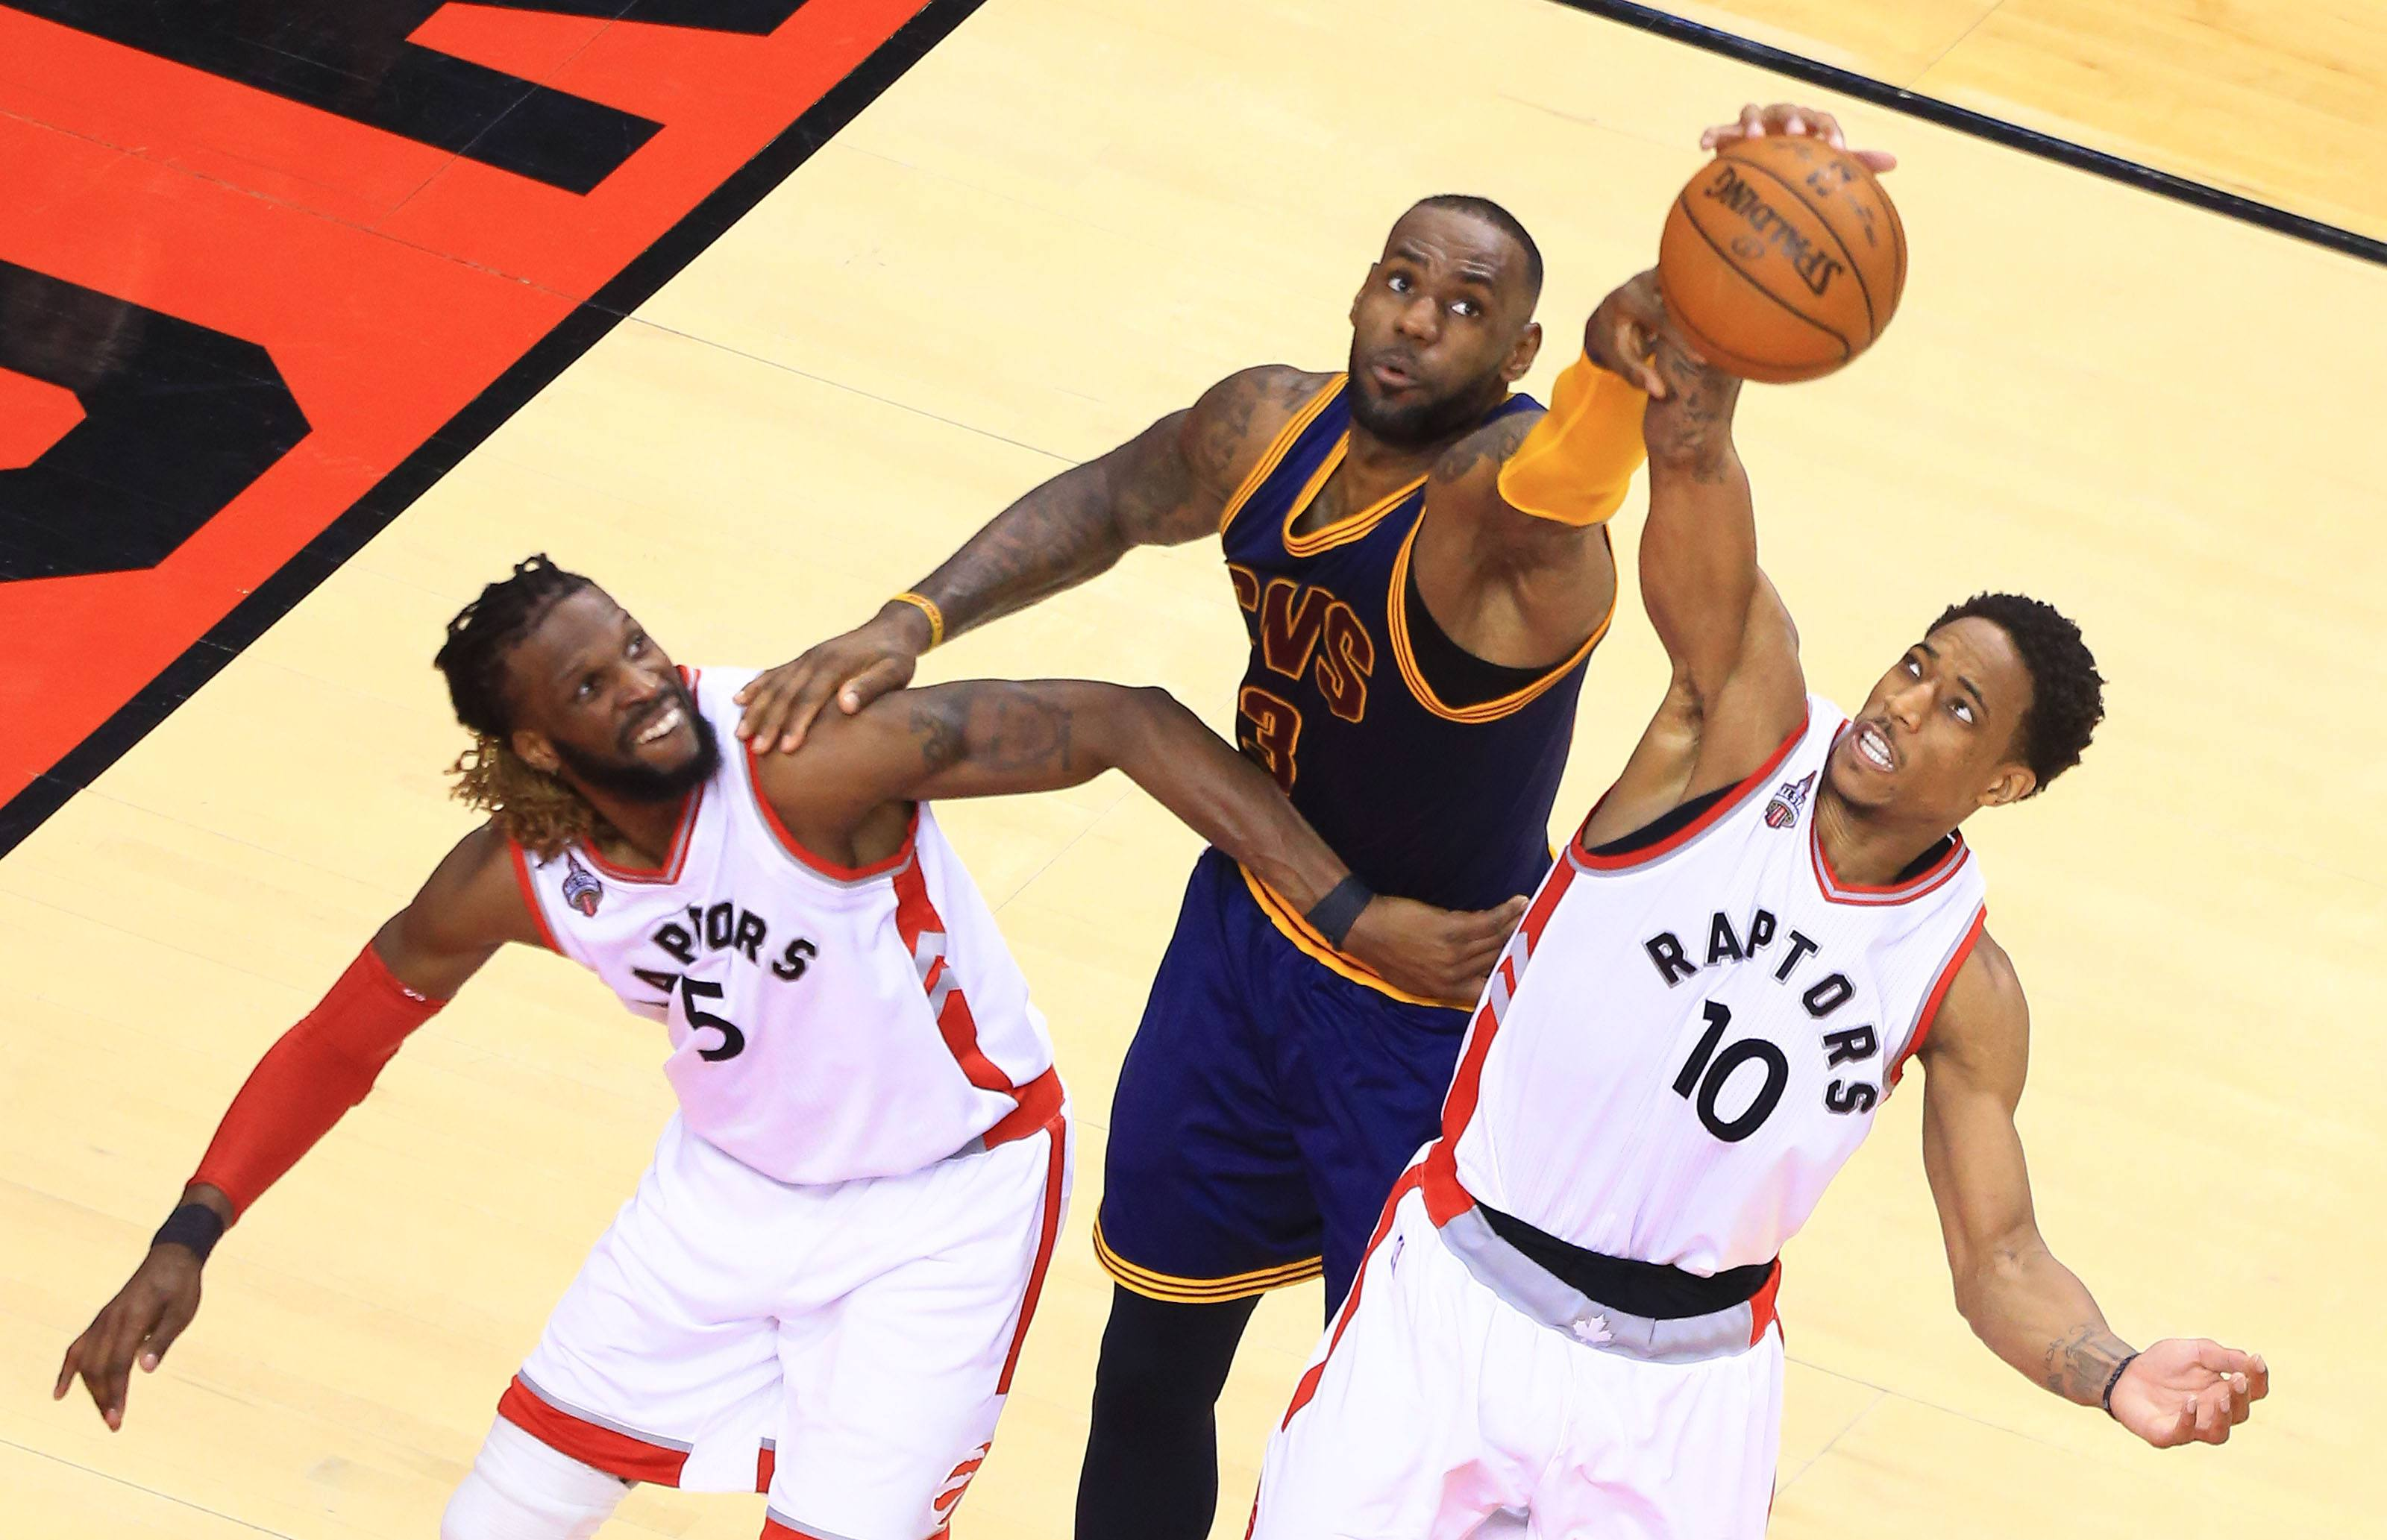 NBA最新夺冠赔率:火箭勇士并列第一 绿军遭看衰